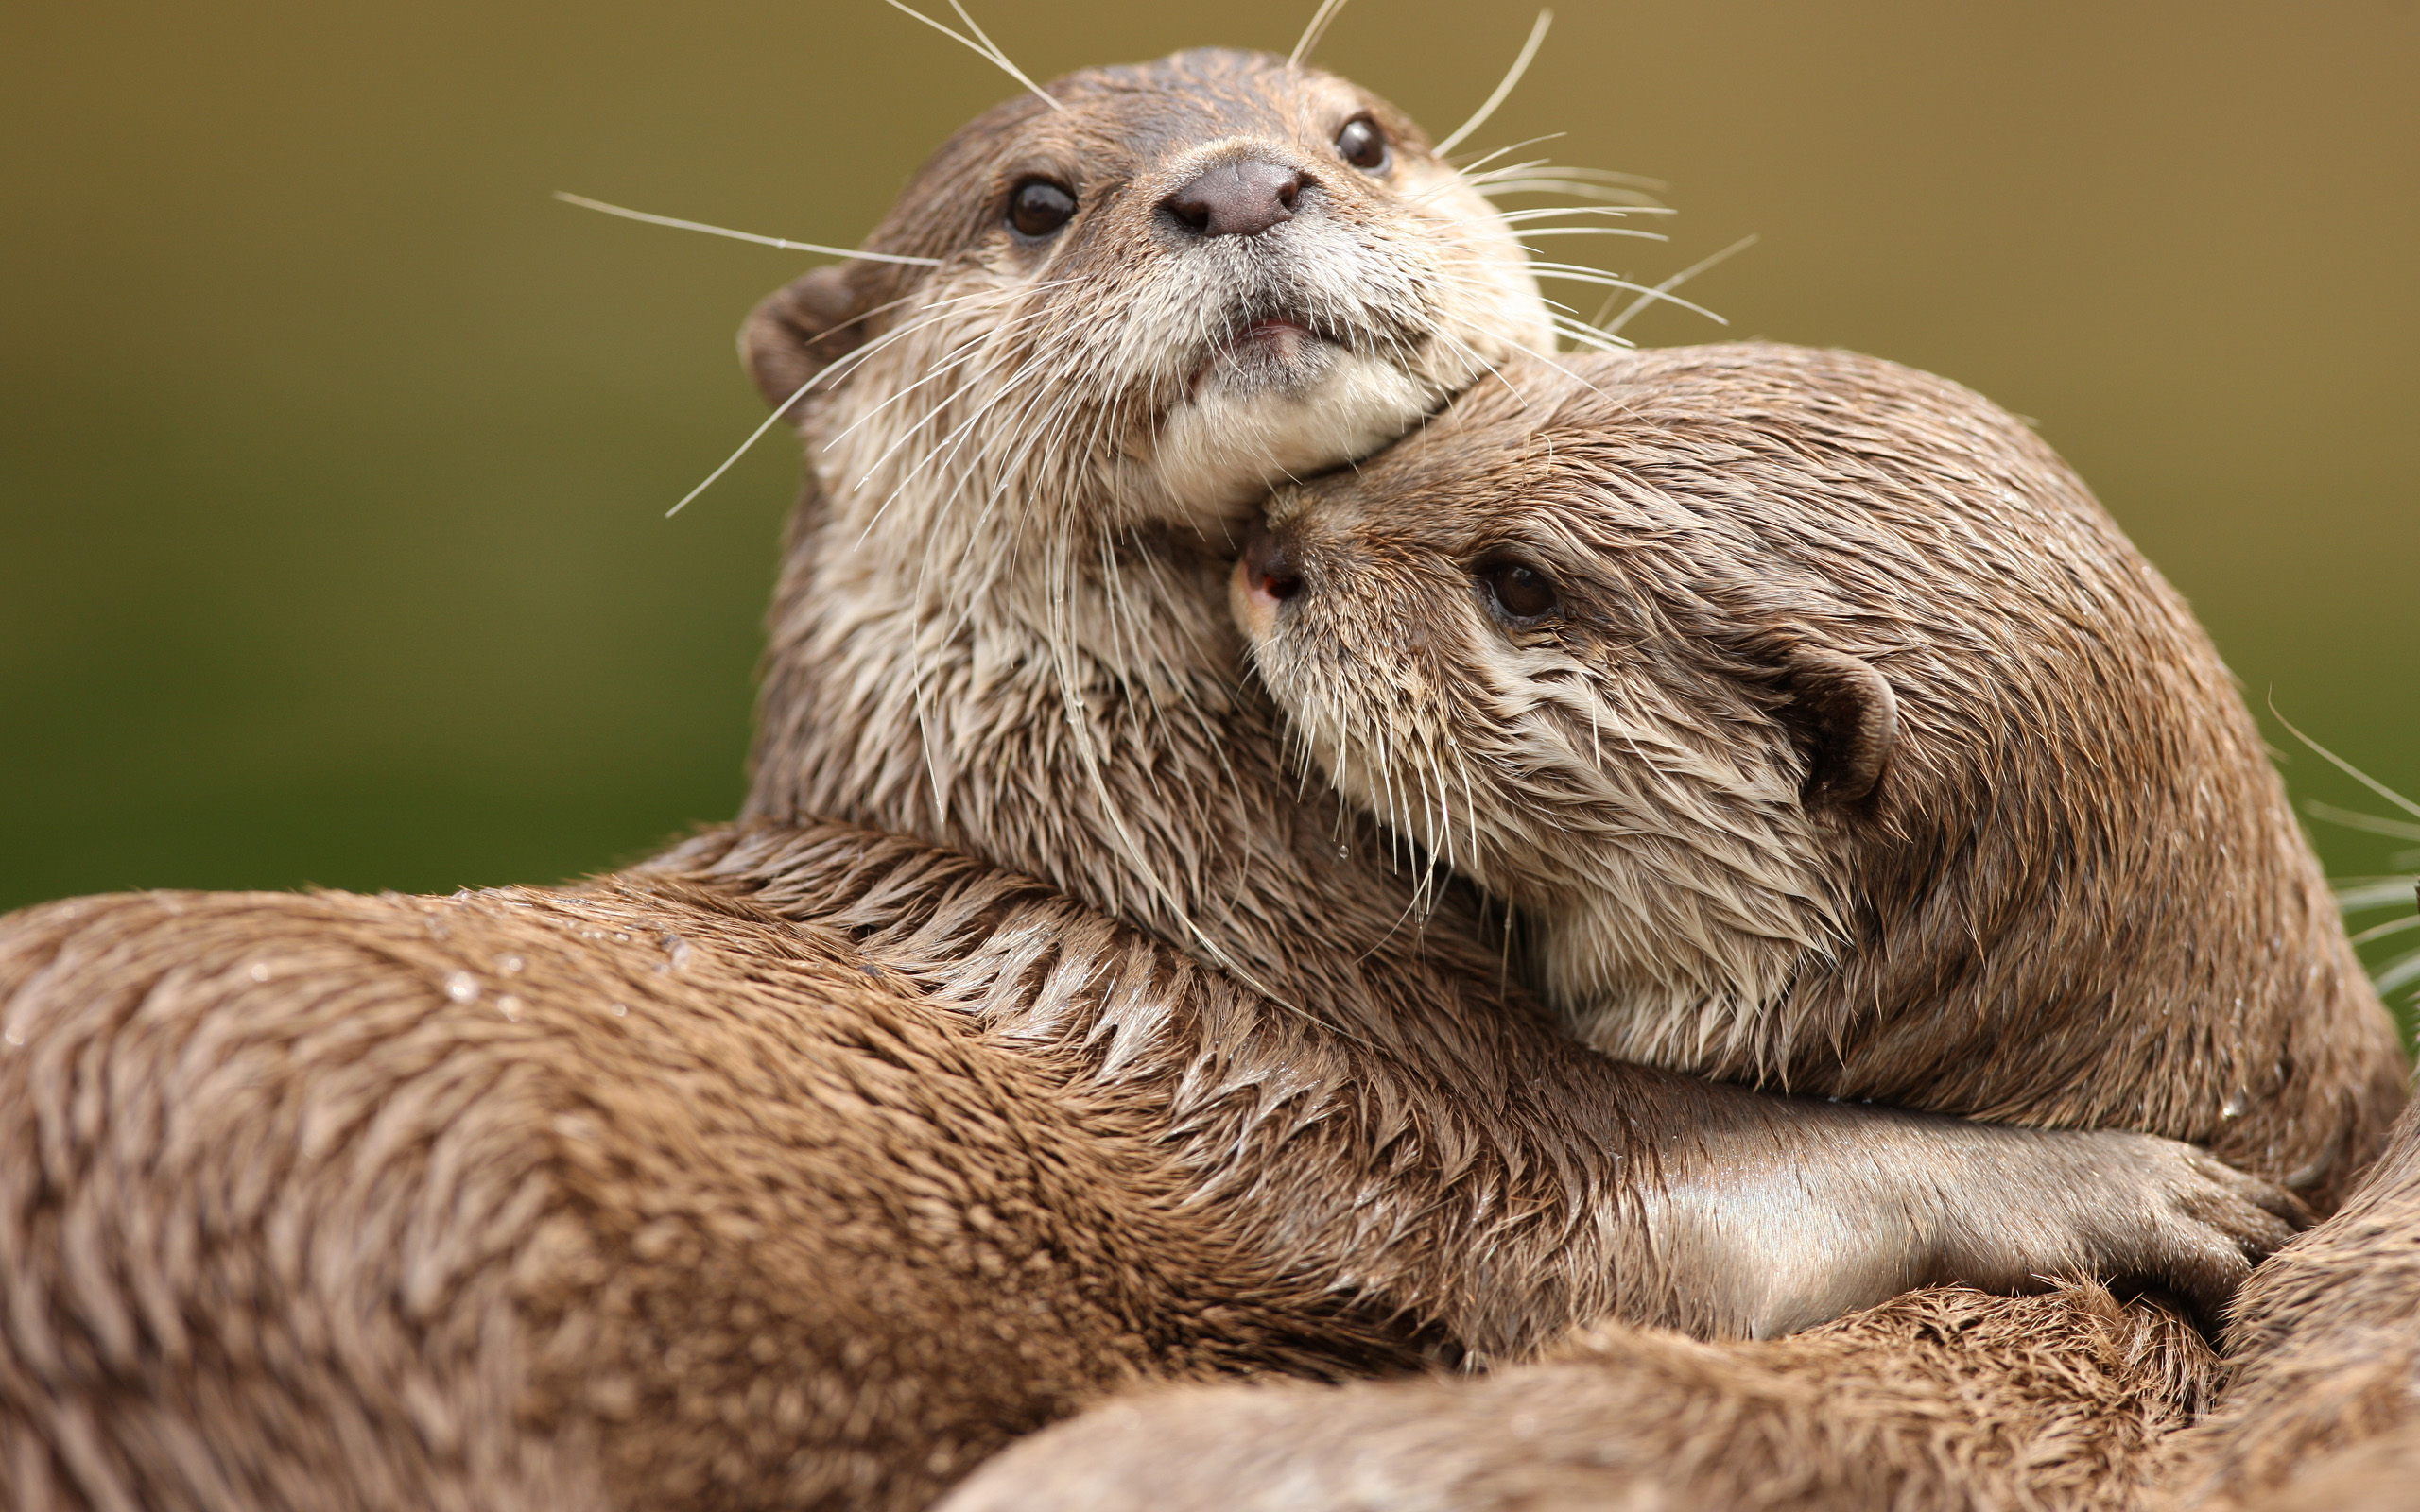 Baby River Otter wallpaper 2560x1600